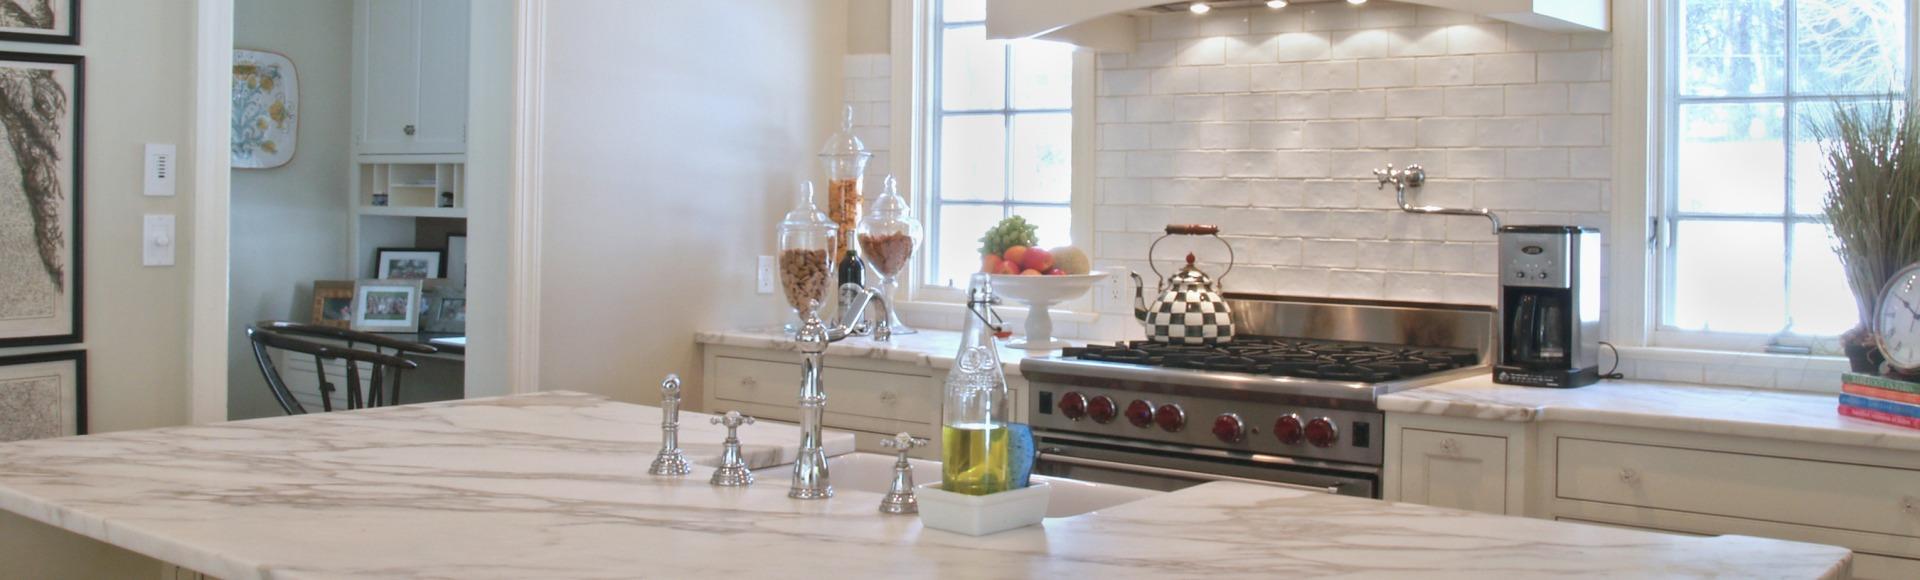 custom kitchen design and kitchen remodeling services, san diego